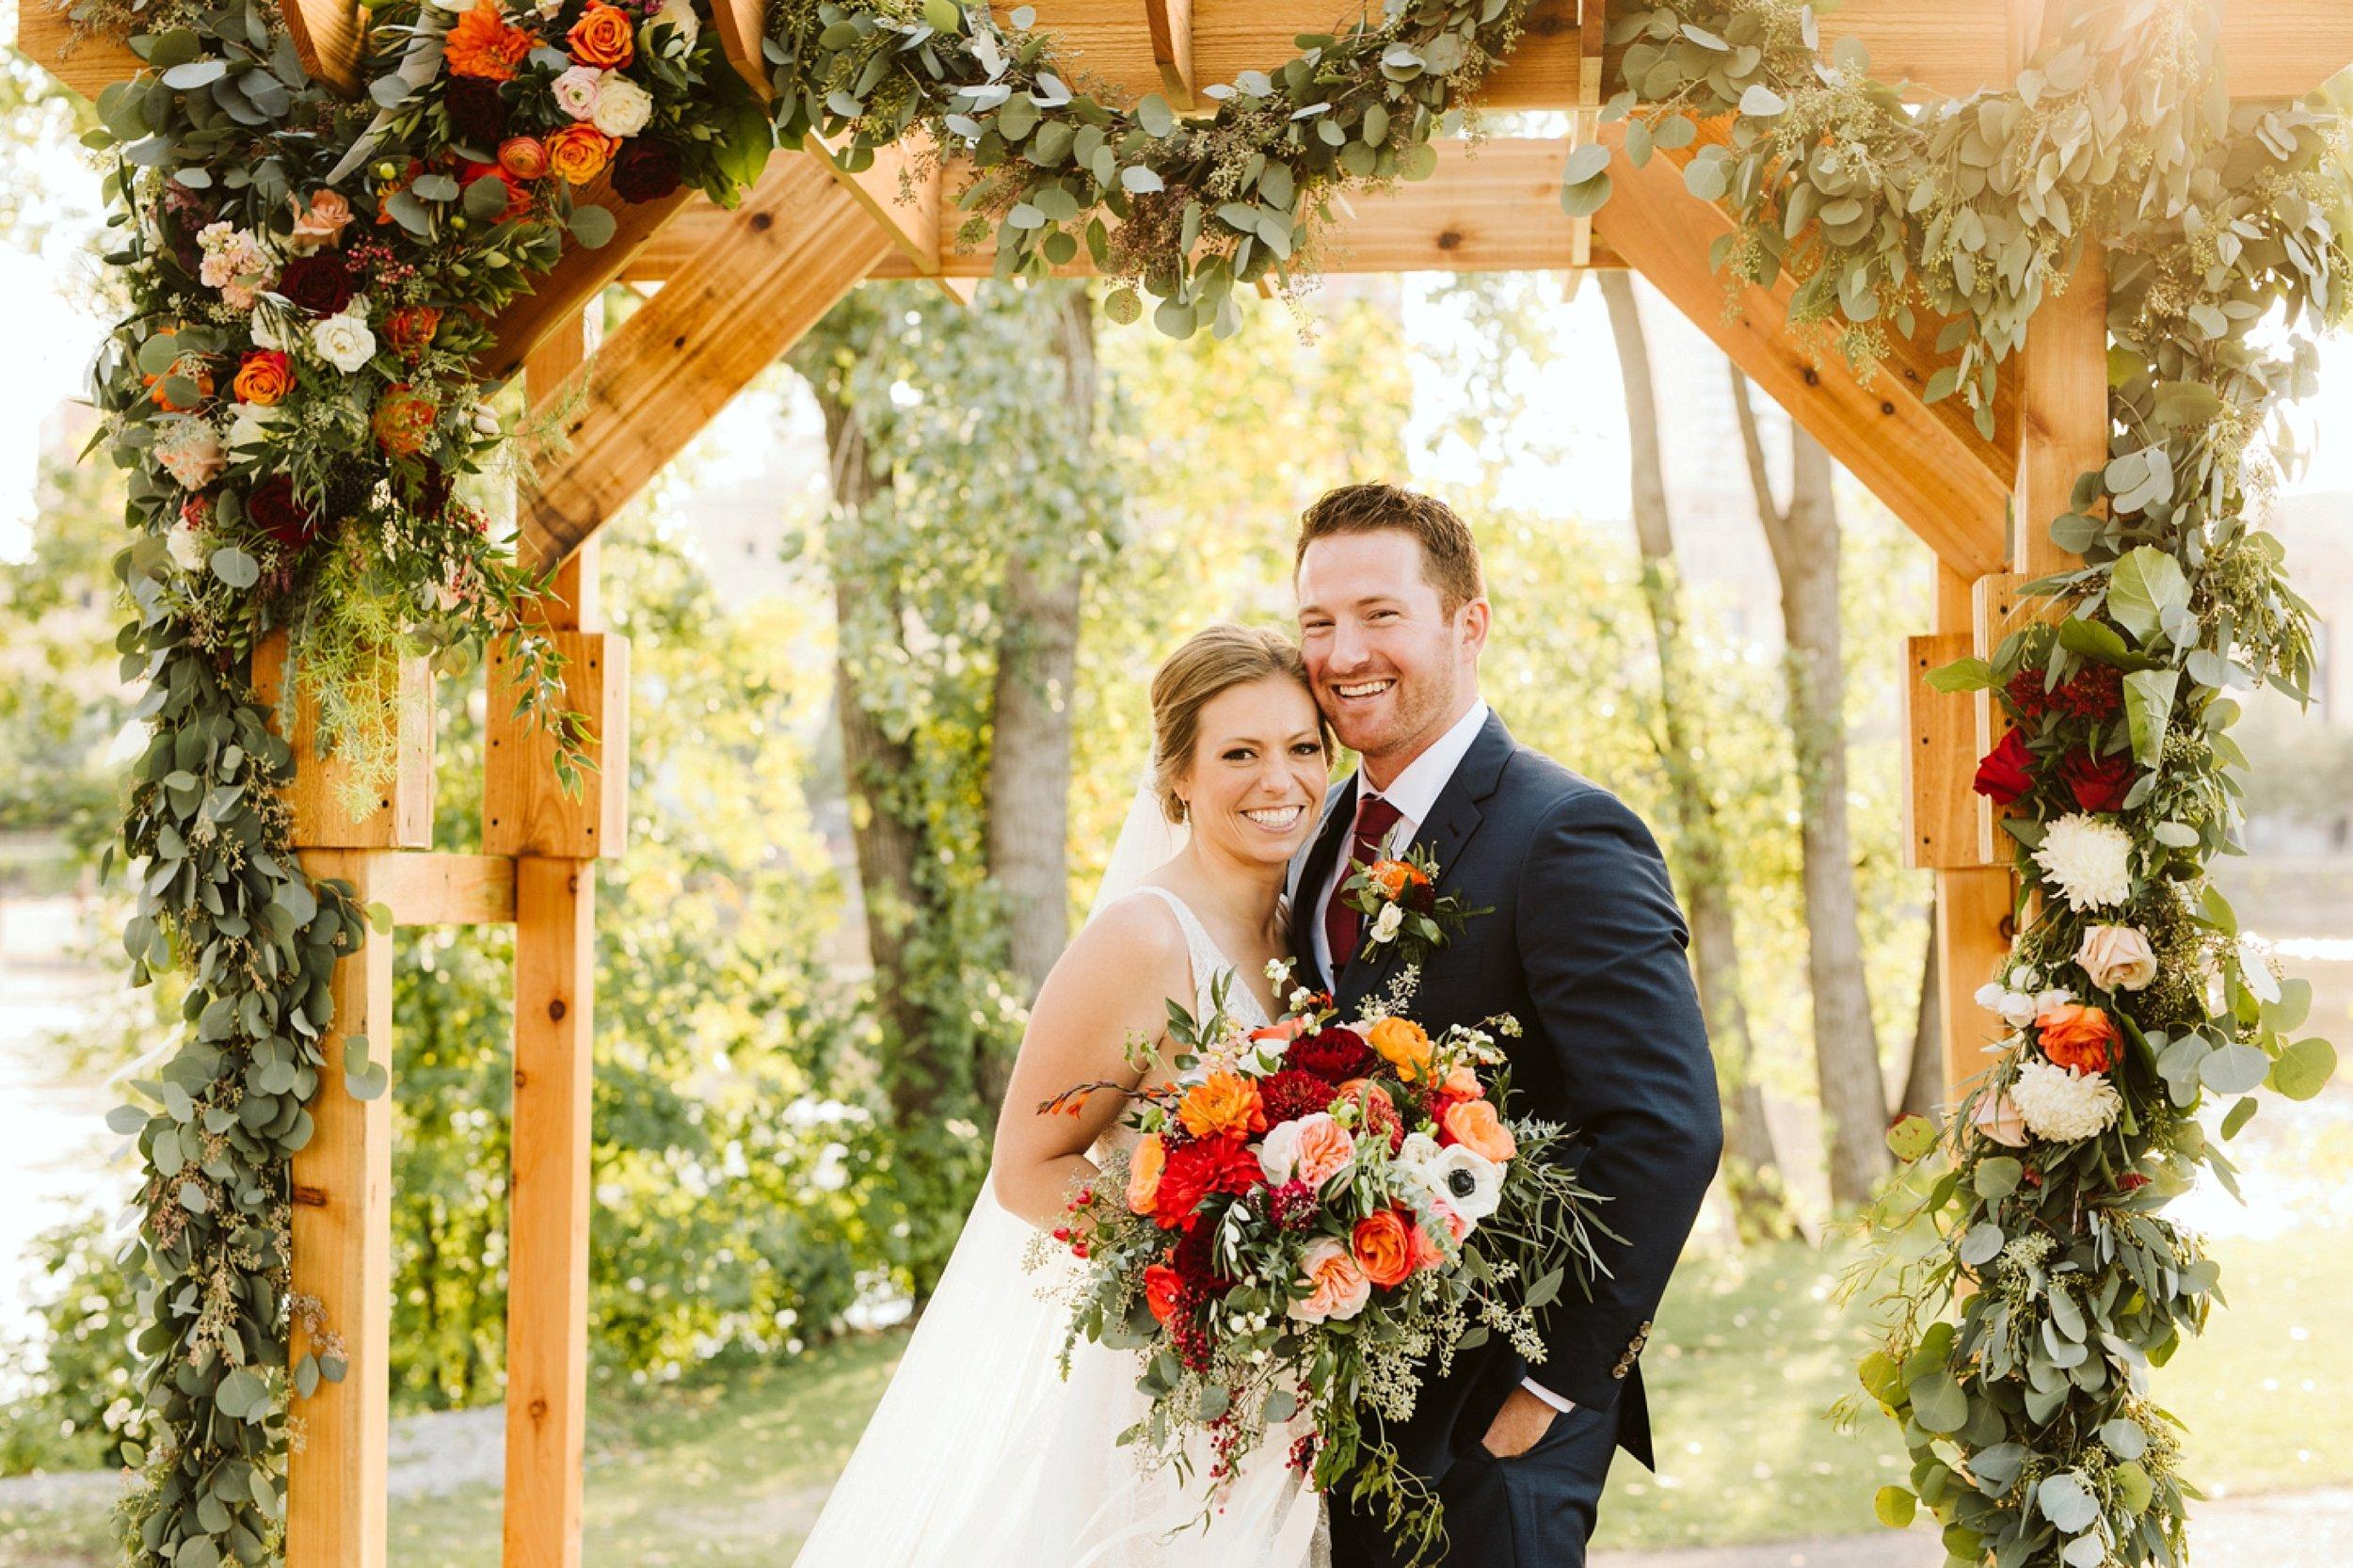 Nicollet-Island-Pavilion-Minneapolis-September-Coral-Navy-Wedding-62.jpg